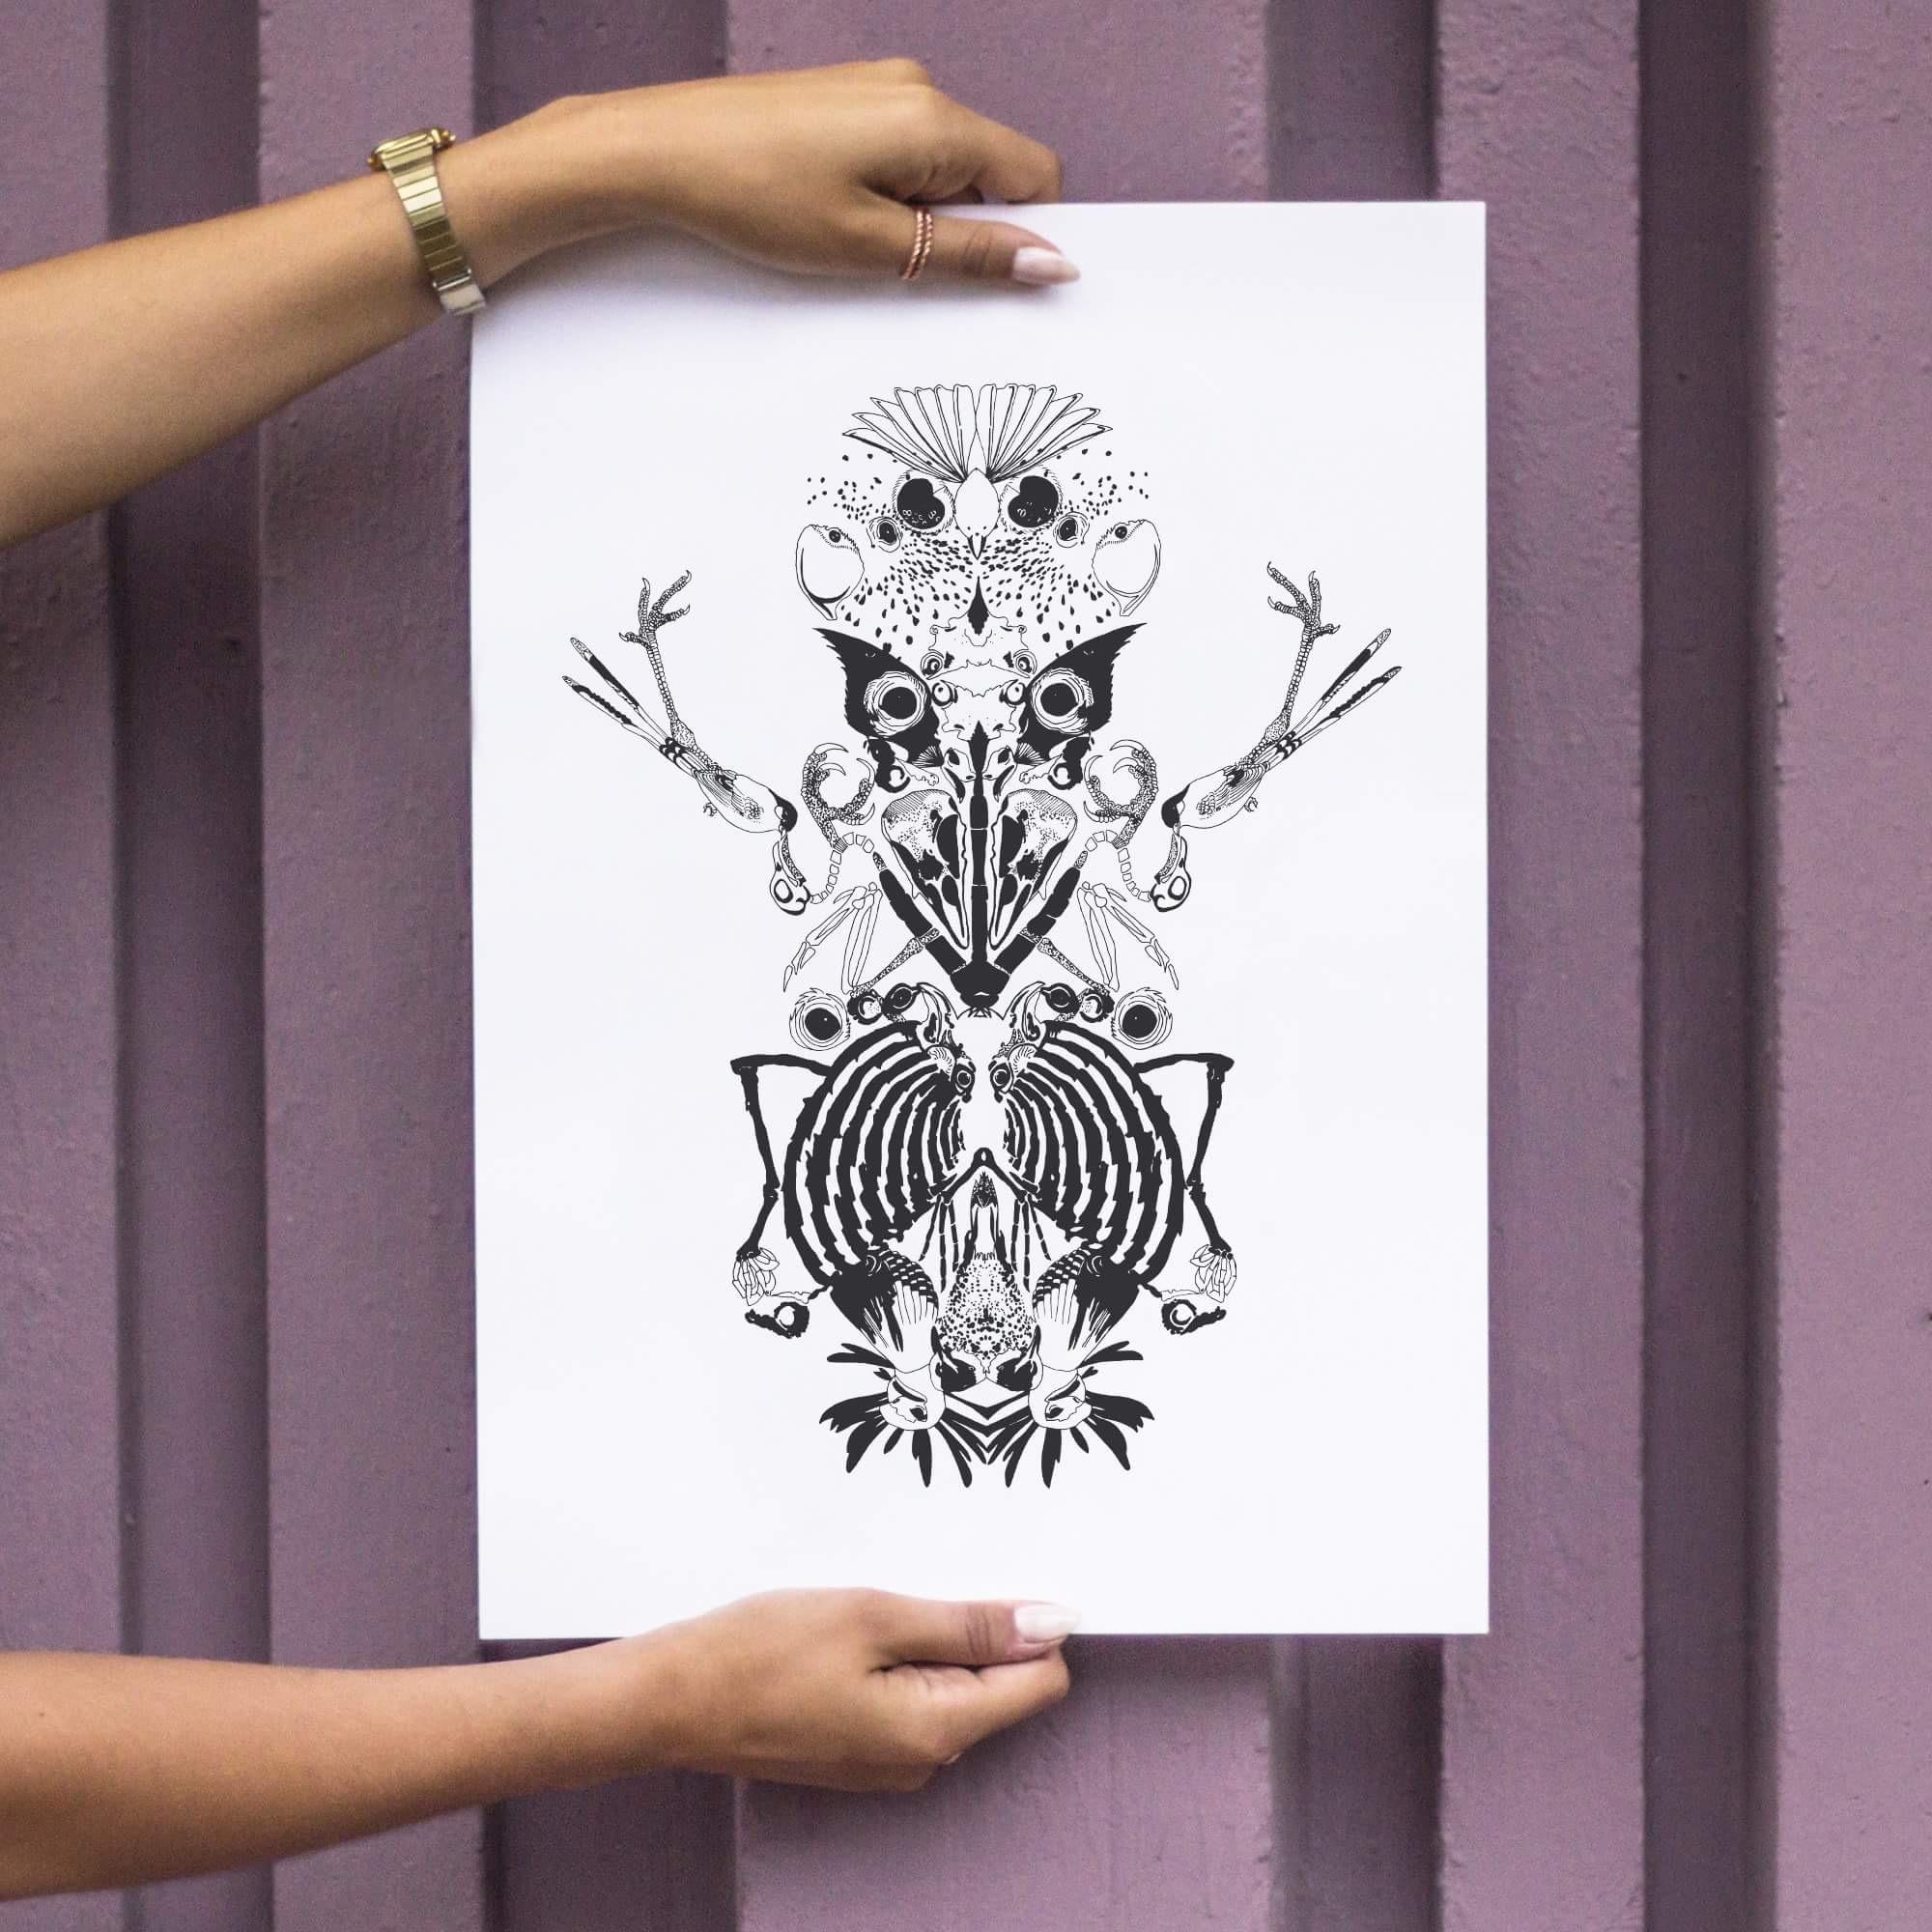 LaureMjoy x EstelleTestForYou - Poster 2